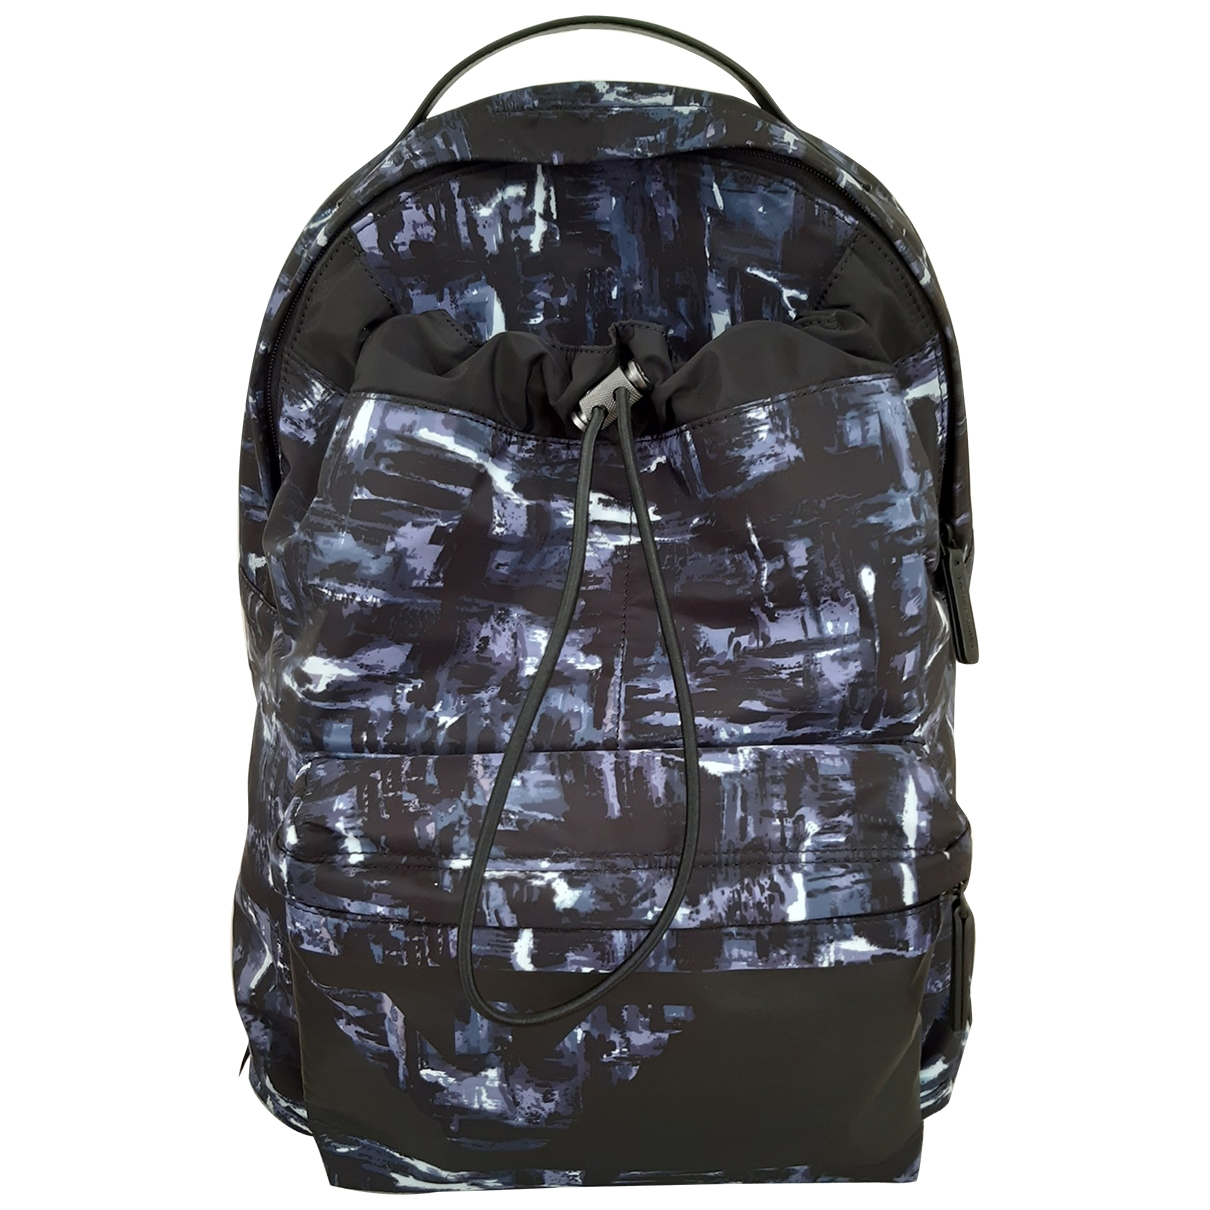 Emporio Armani \N Blue bag for Men \N